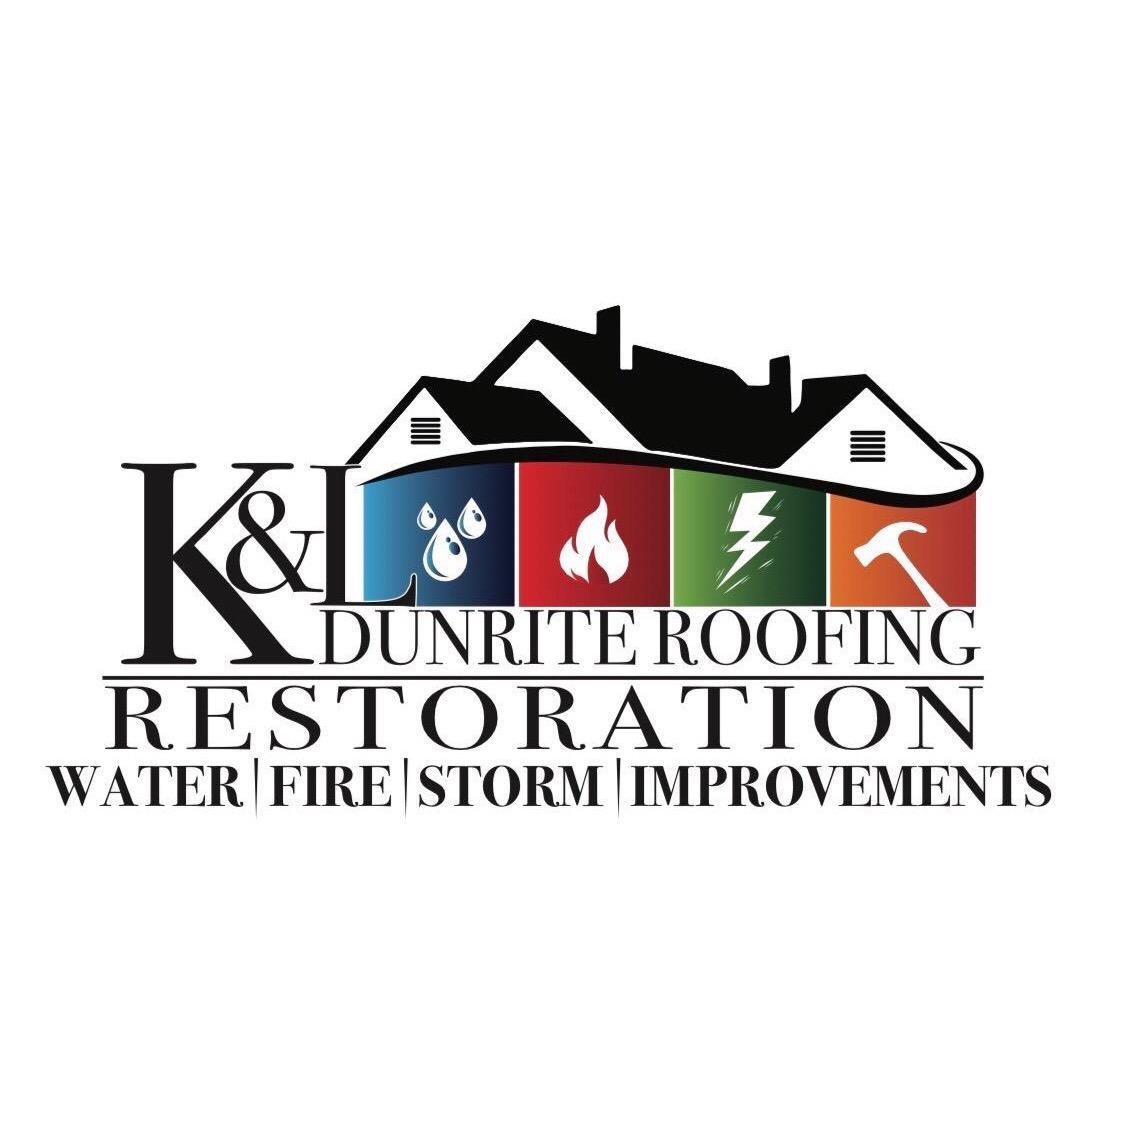 K&L Dunrite Roofing and Restoration Hilton Head Island image 2